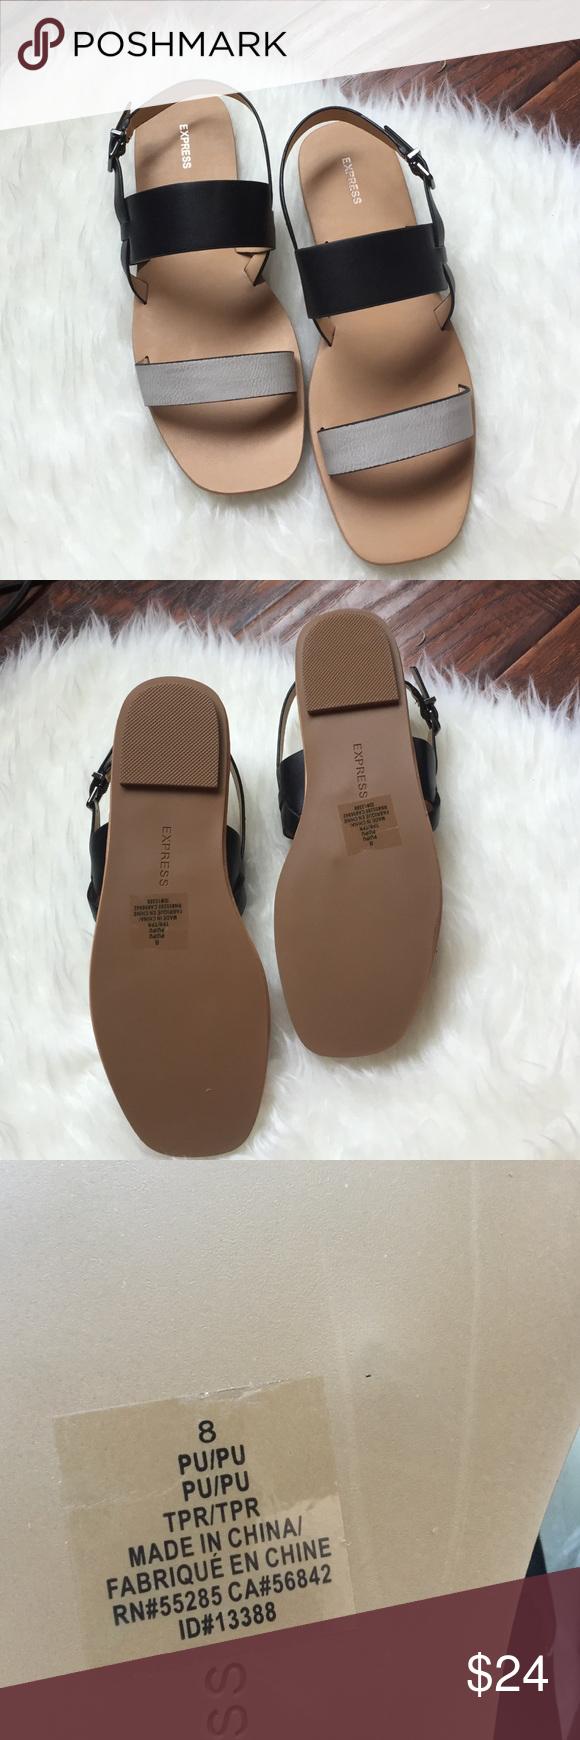 3e904d4b1758eb 💝HP 9-16-16💝Express Sandals👡 💝Casual Friday HP💝Express Black   Gray  Sandals💝👡 Express Shoes Sandals